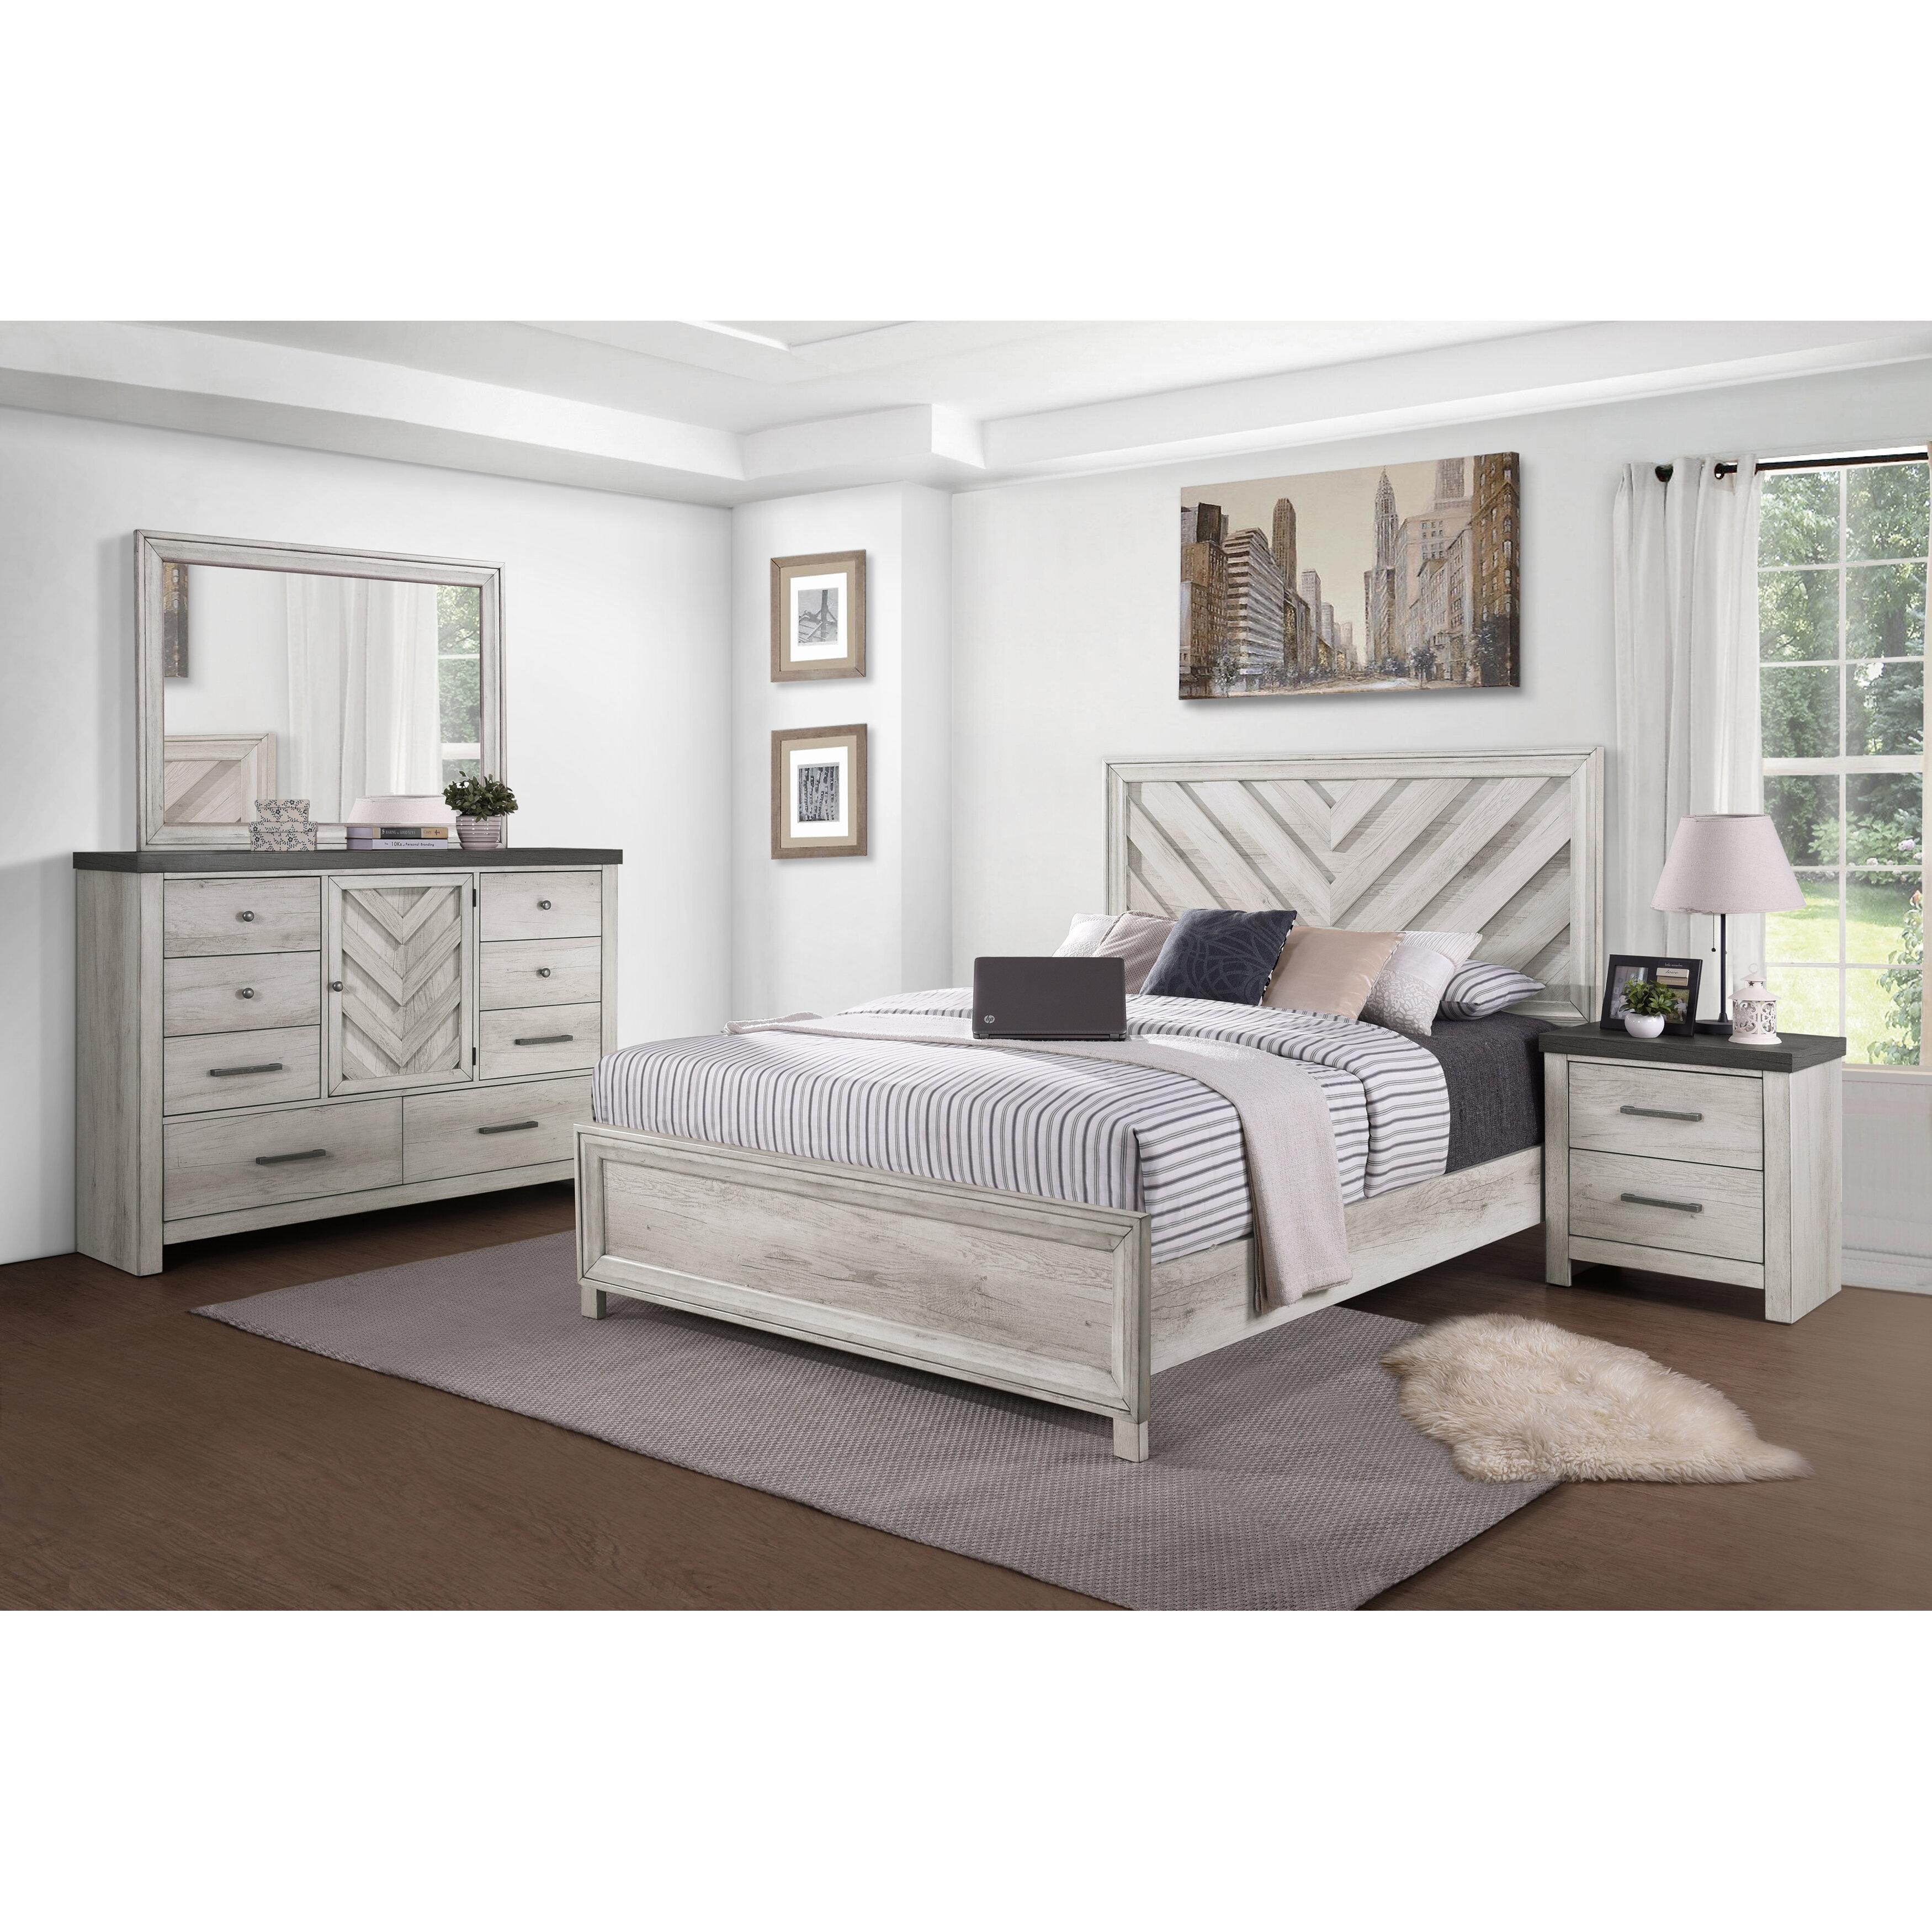 Coastal Farmhouse Baby Kids Morrison Standard Configurable Bedroom Set Reviews Wayfair Ca